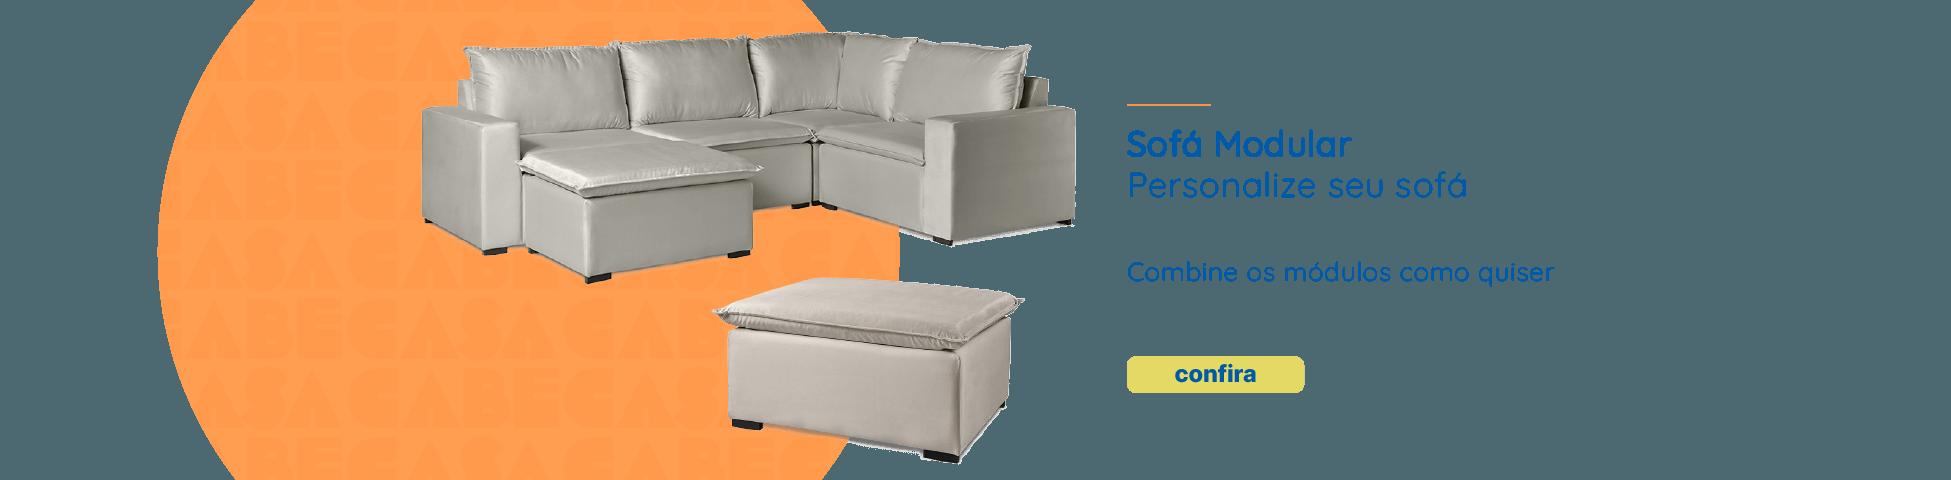 CabeCasa | Linha Ibi Modular. Sofá Modular. Personalize seu sofá.